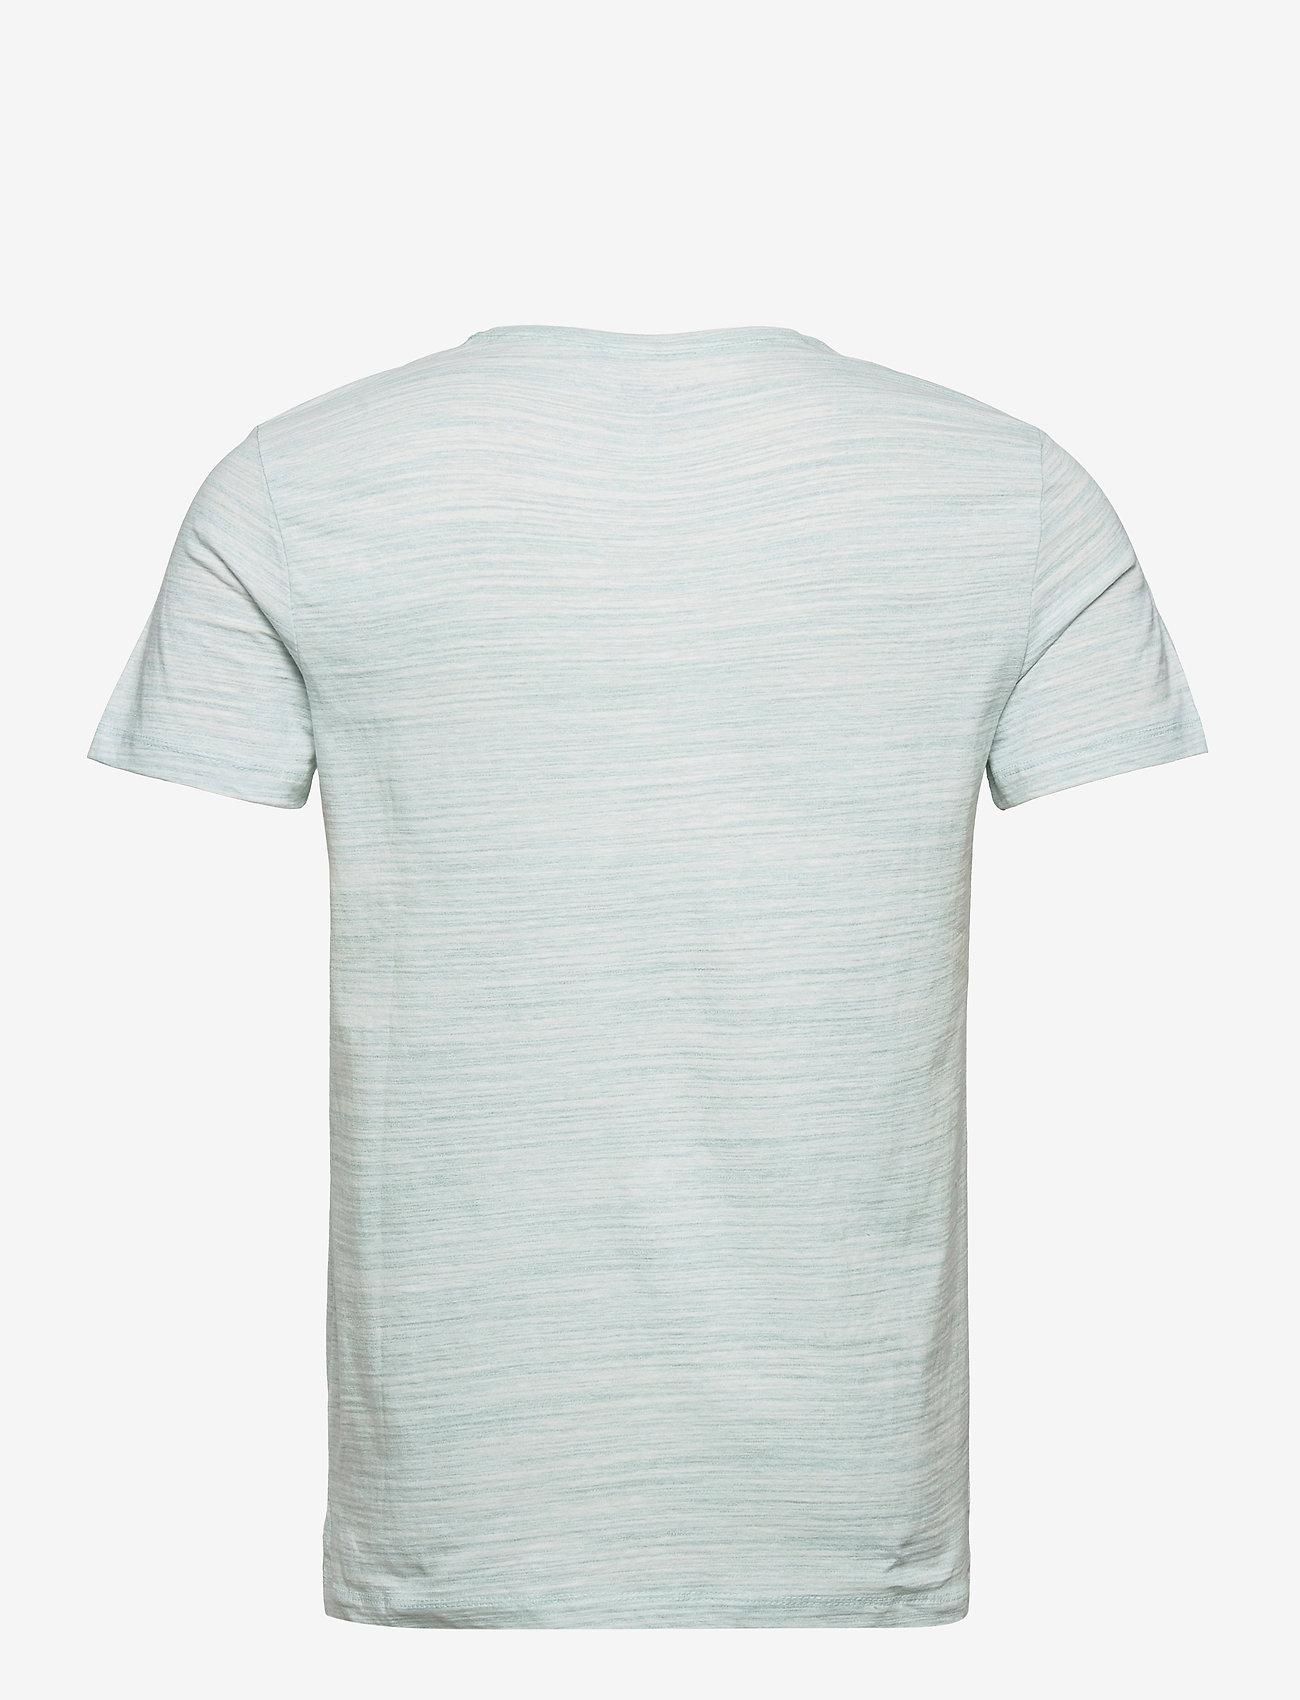 Blend - Tee - basic t-shirts - pastel turquoise - 1